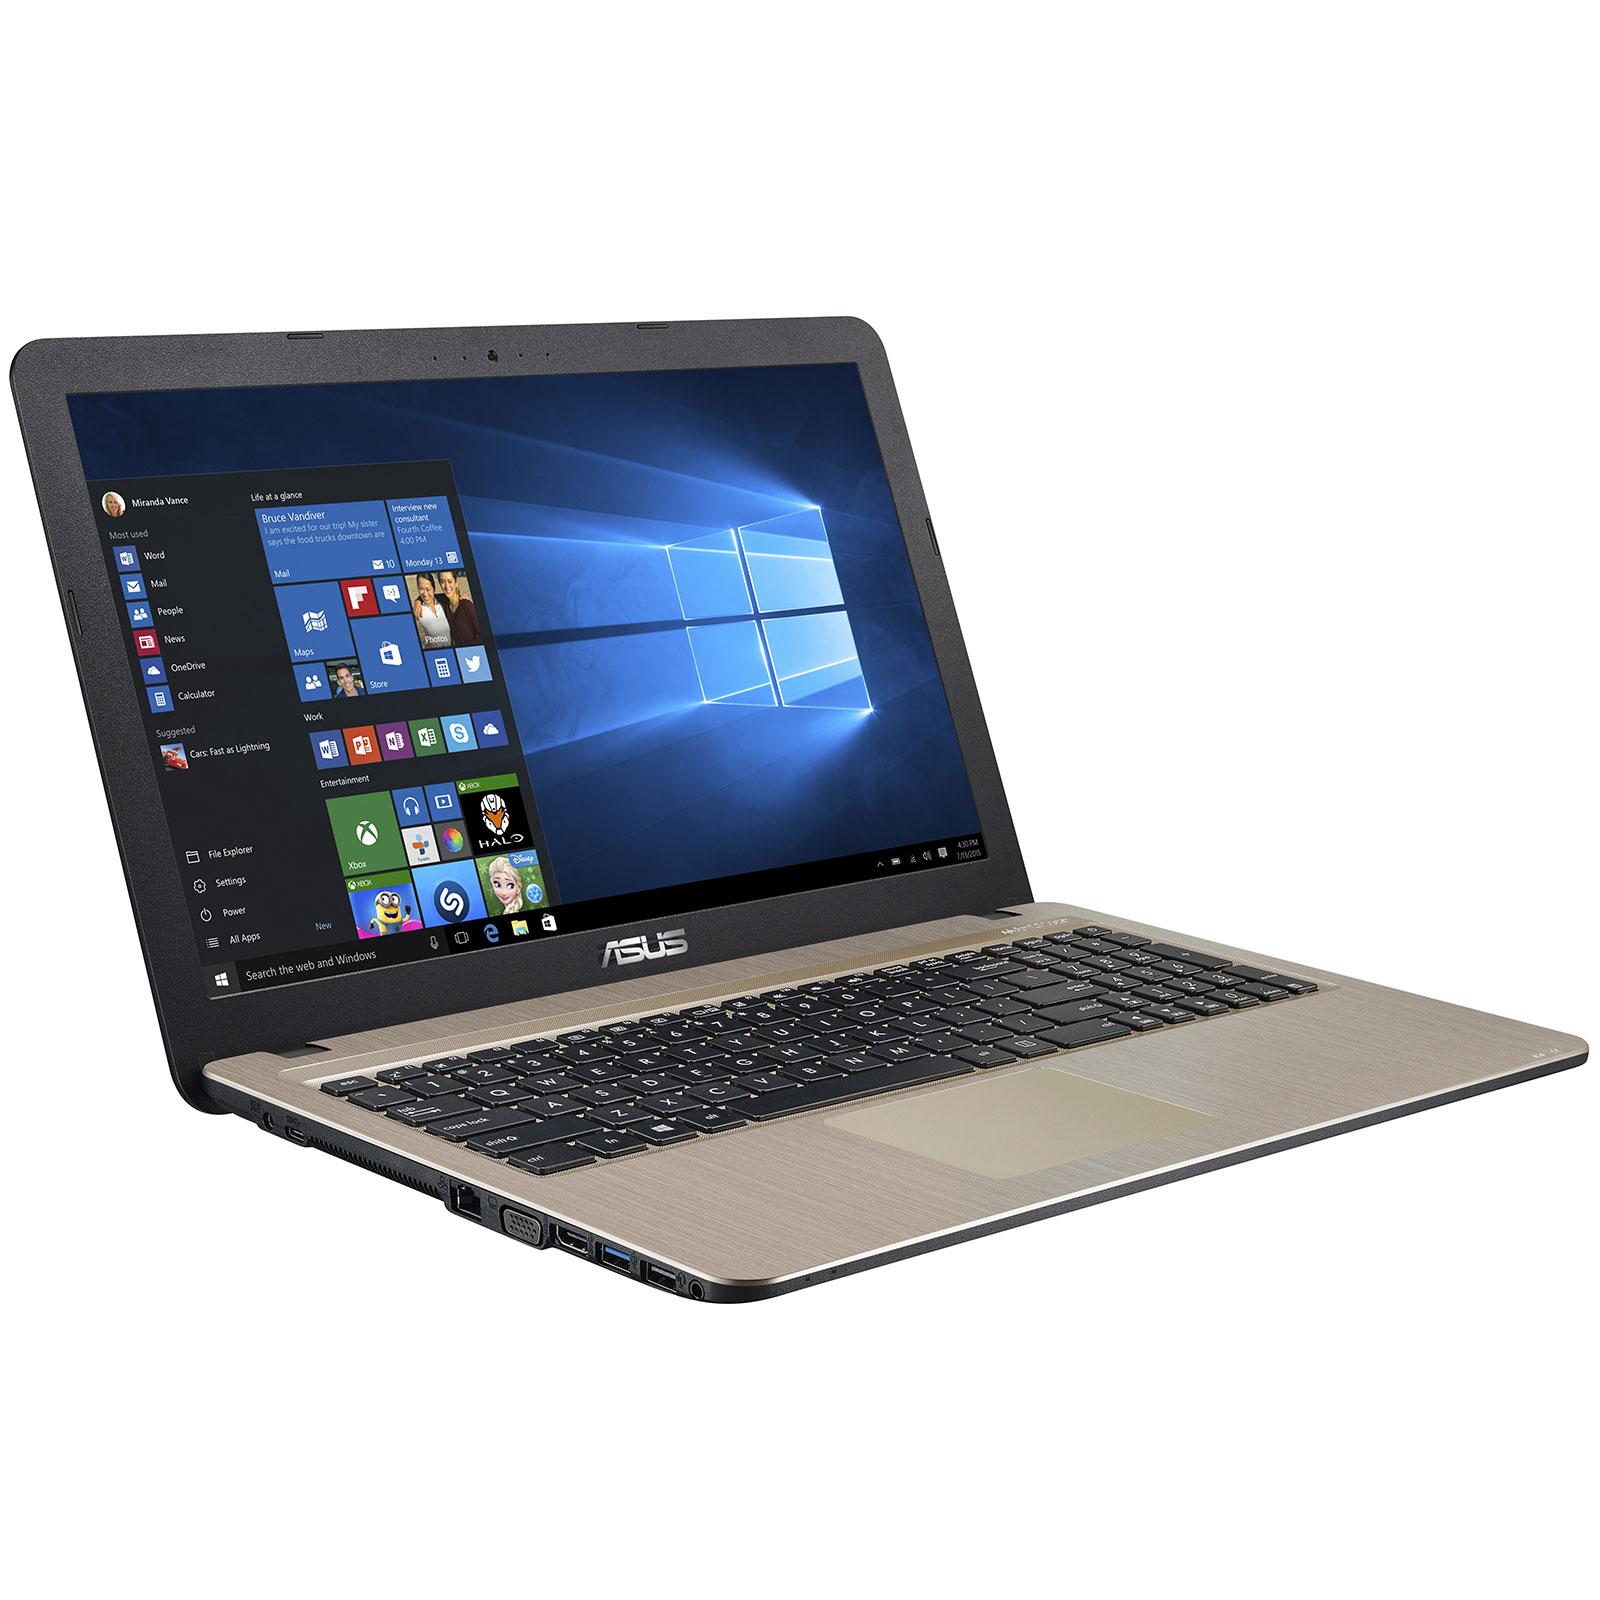 "PC portable ASUS R540UB-DM206 Intel Core i3-6006U 8 Go SSD 256 Go 15.6"" LED Full HD NVIDIA GeForce MX110 Wi-Fi N/Bluetooth Webcam Endless OS (garantie constructeur 2 ans)"